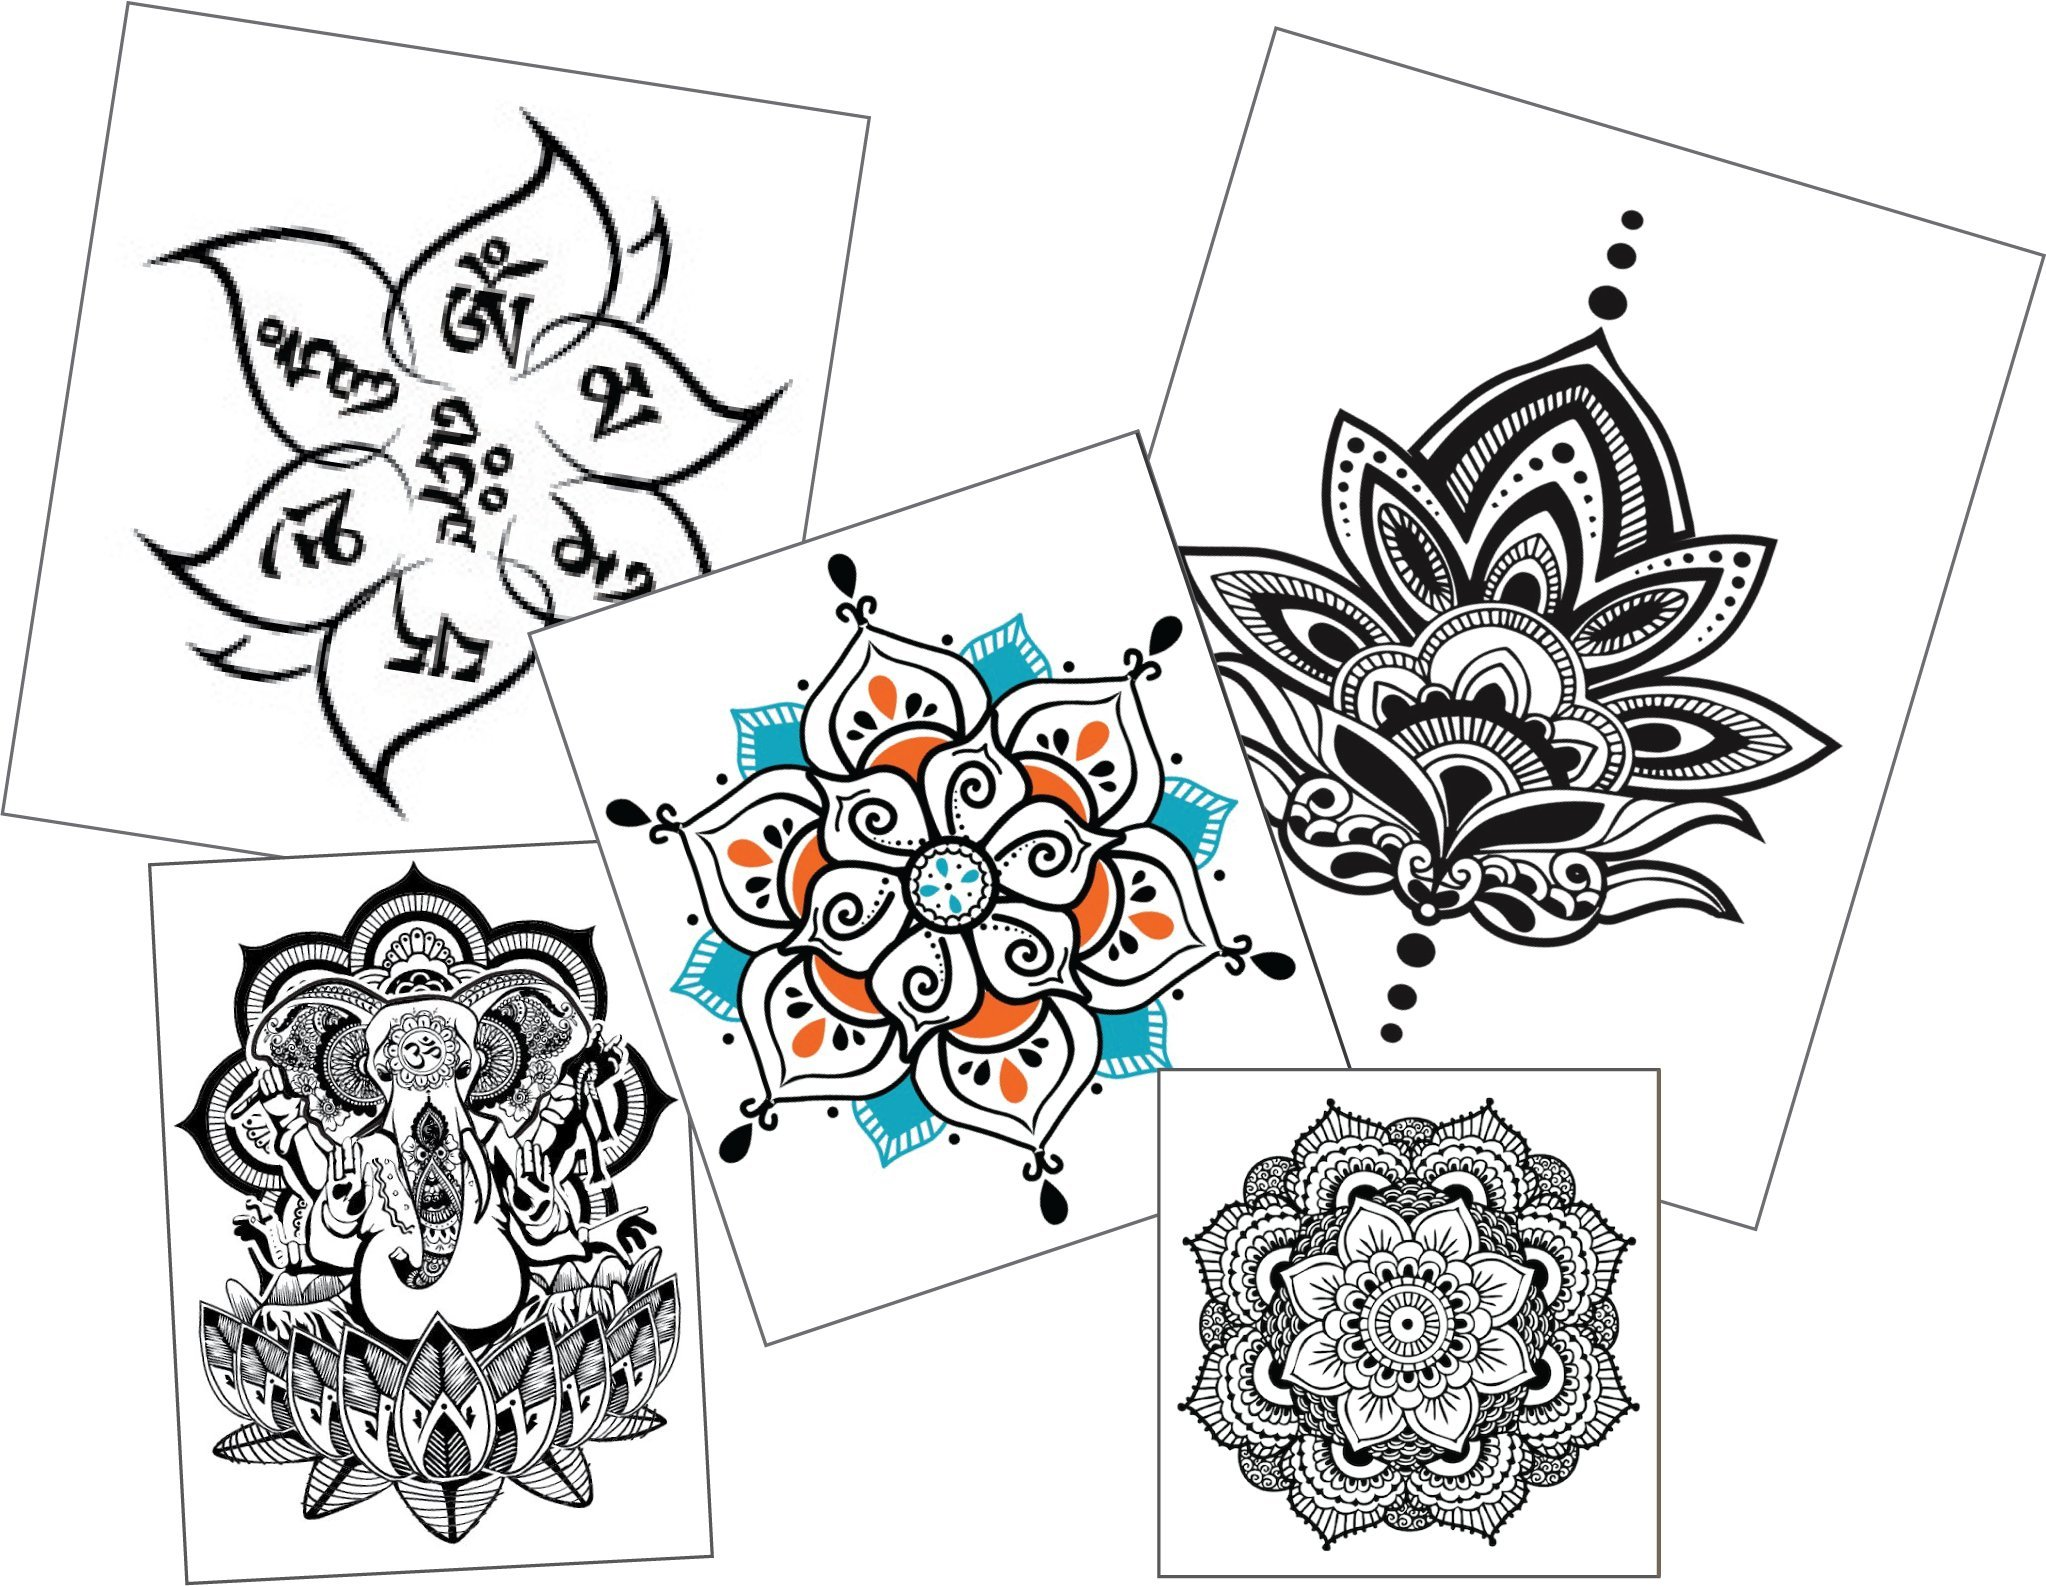 Cheap lotus mandala tattoo meaning find lotus mandala tattoo get quotations large mandala temporary tattoo set body art yoga accessory birthday party gift izmirmasajfo